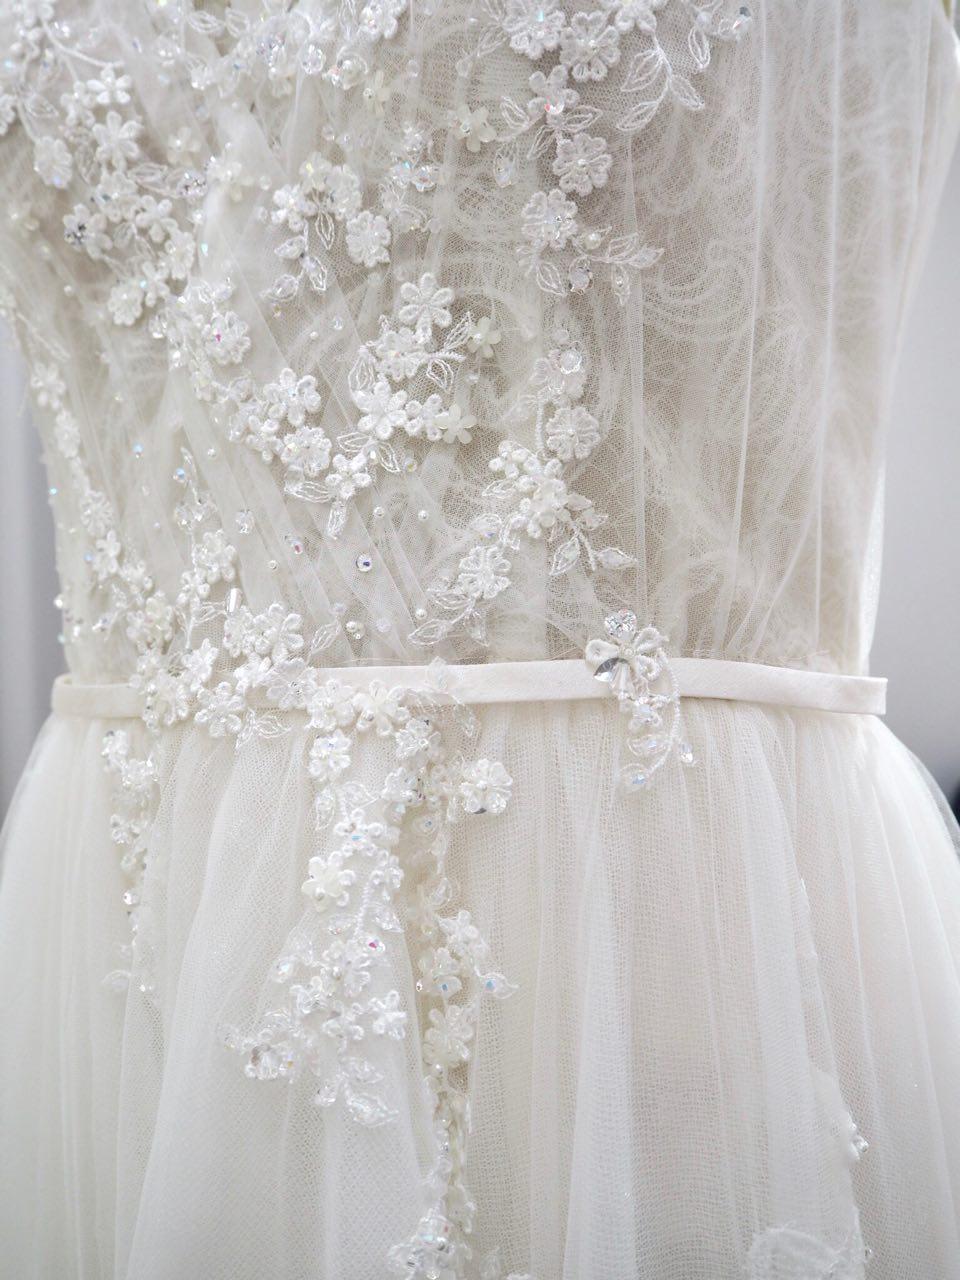 floral+lace+tulle+pleat+wrap+wedding+dress+ccm.jpg